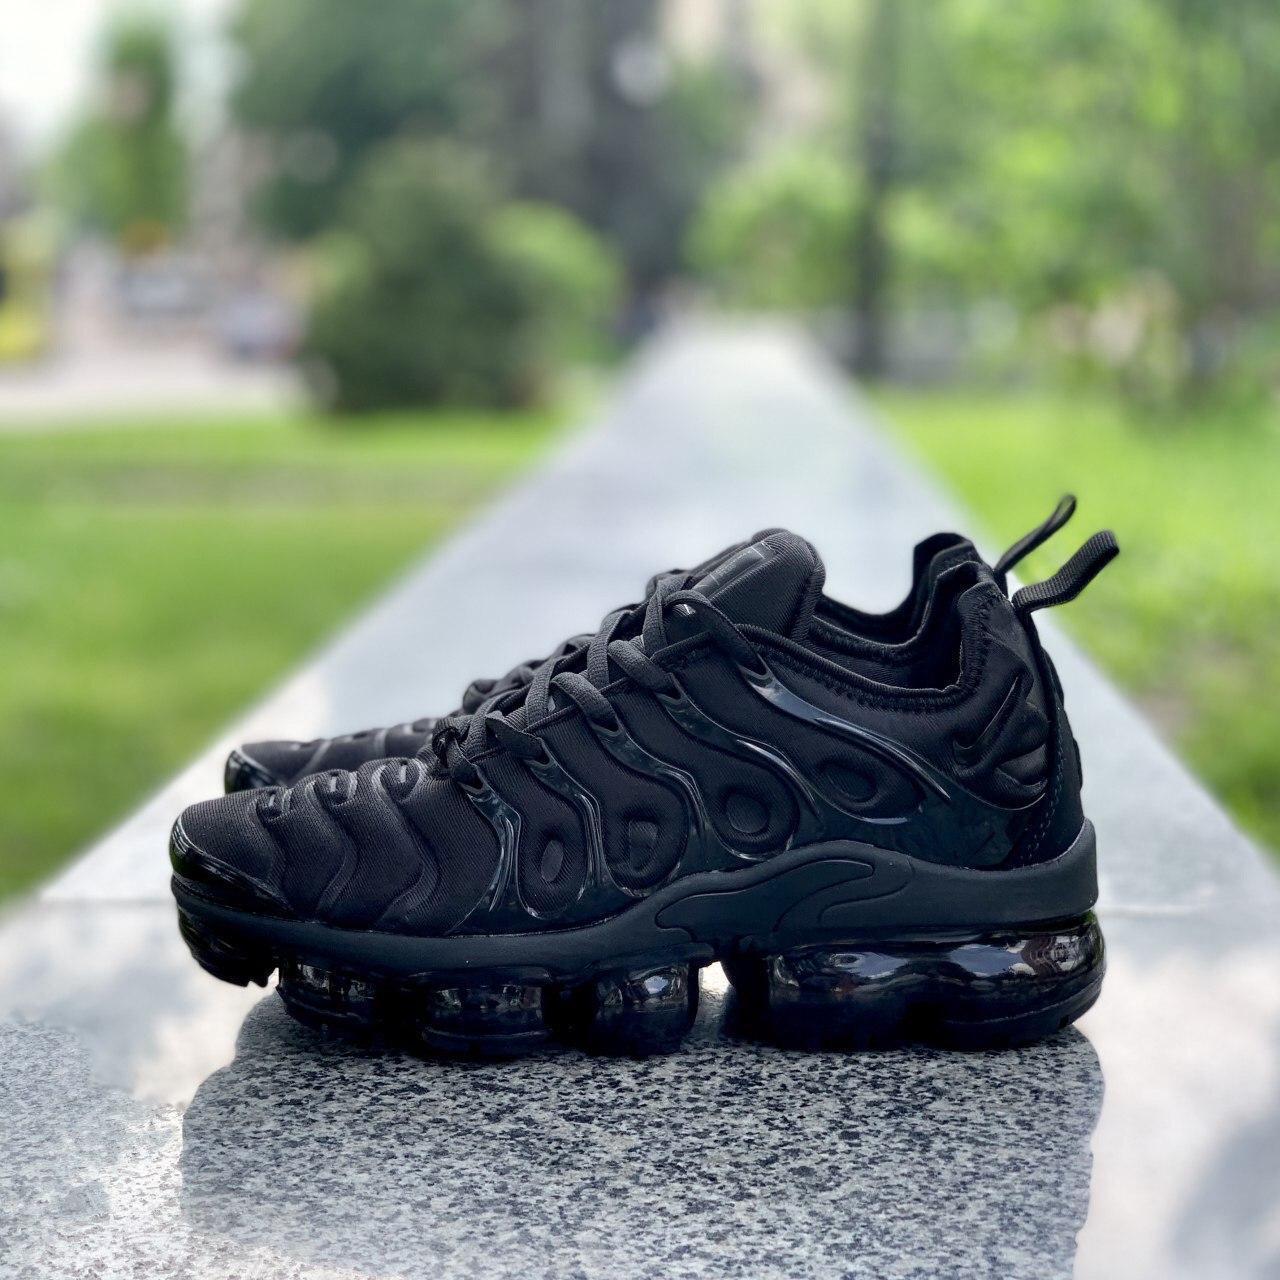 Мужские кроссовки Nike Air VaporMax (Вапормакс) Plus Tn All Black